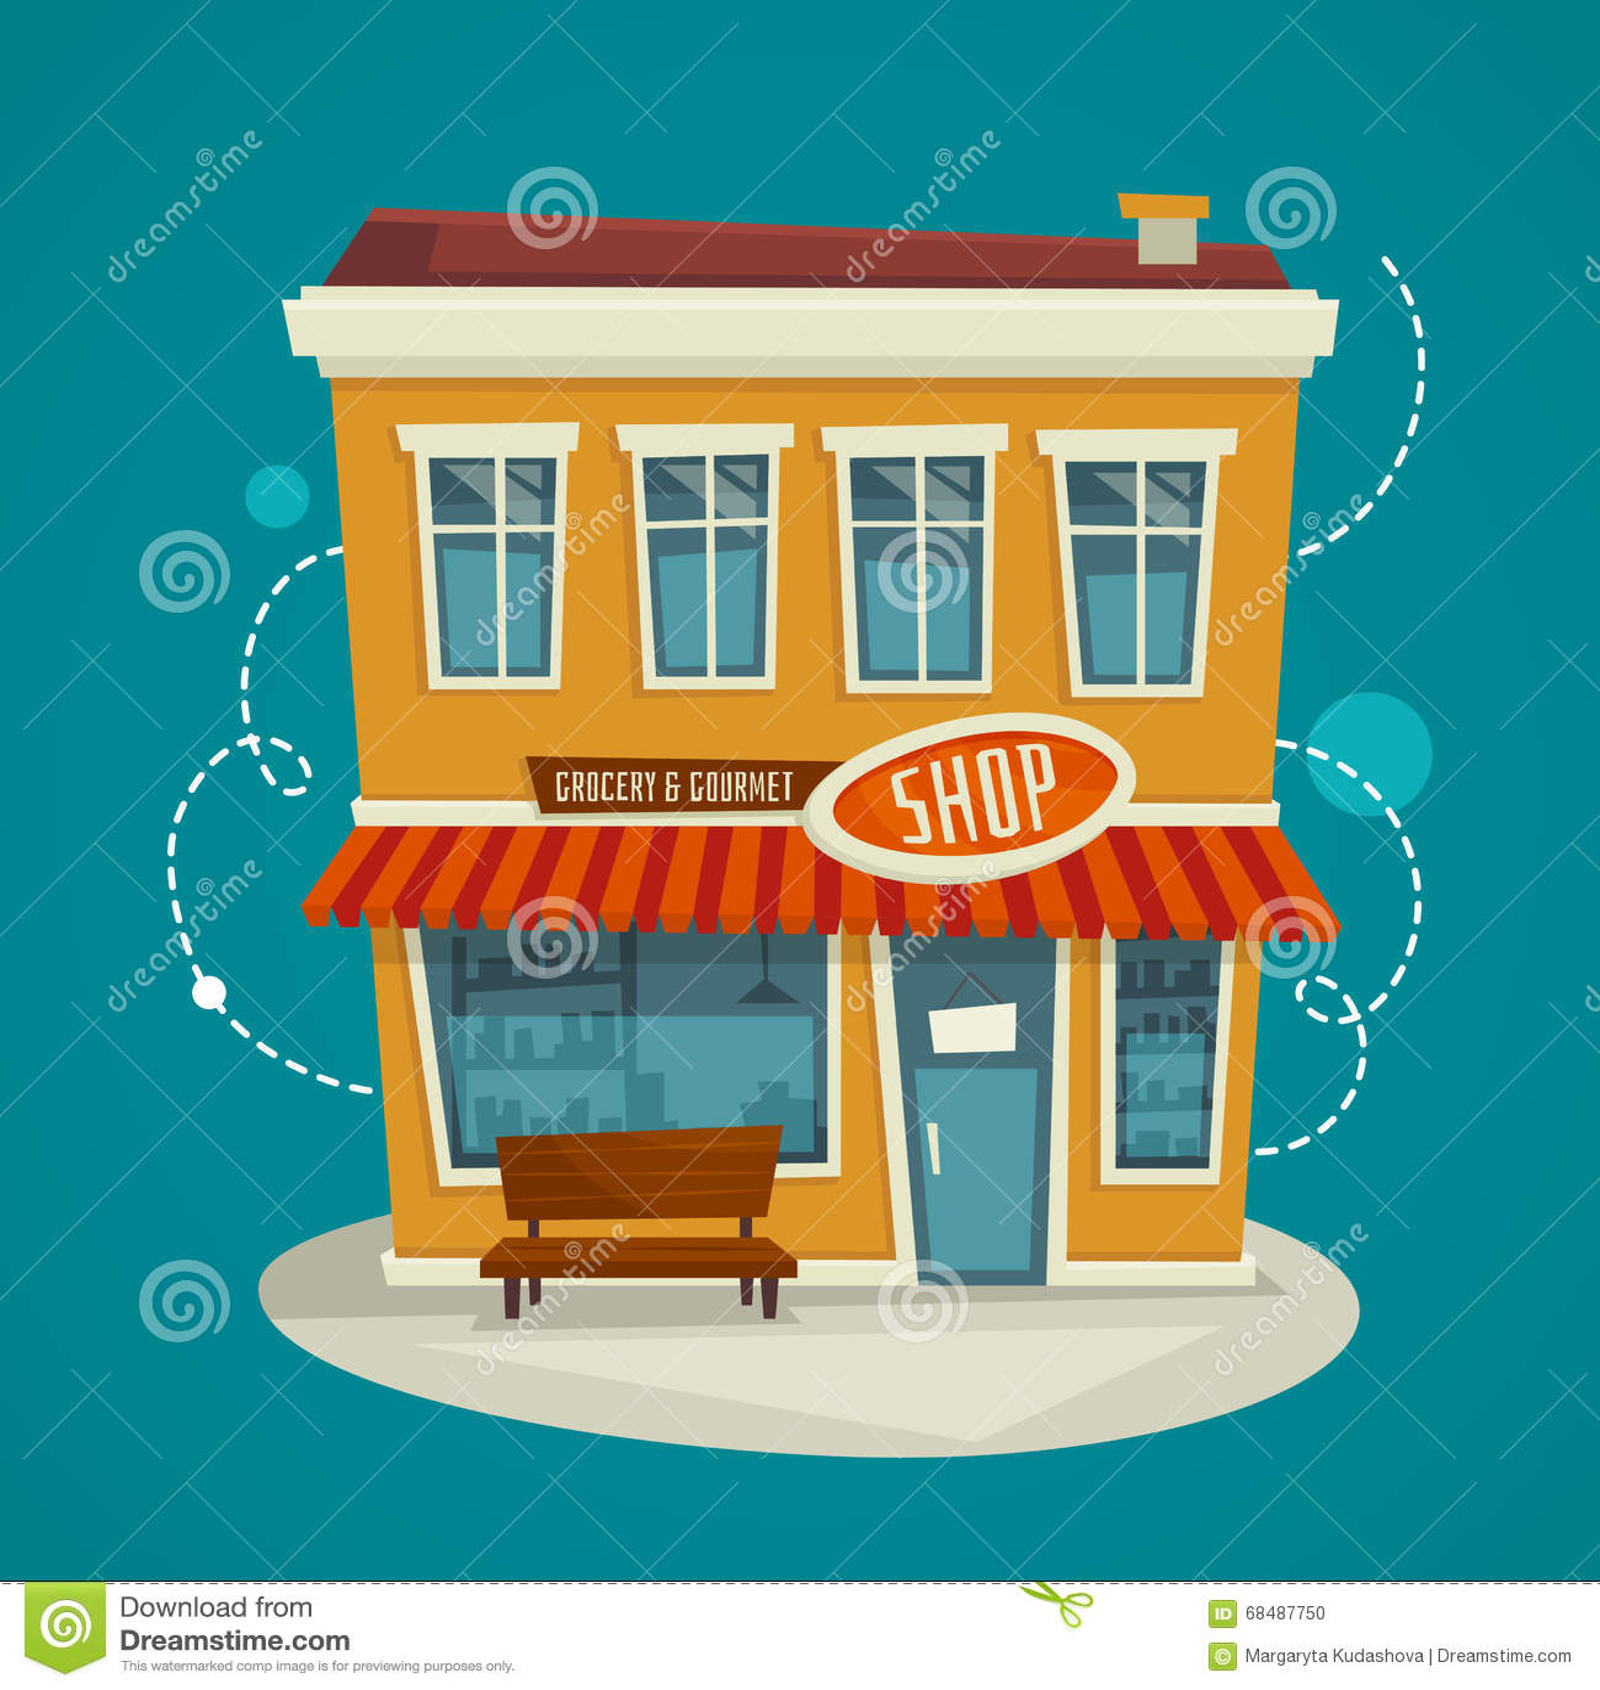 Shop Building Front View Vector Cartoon Illustration